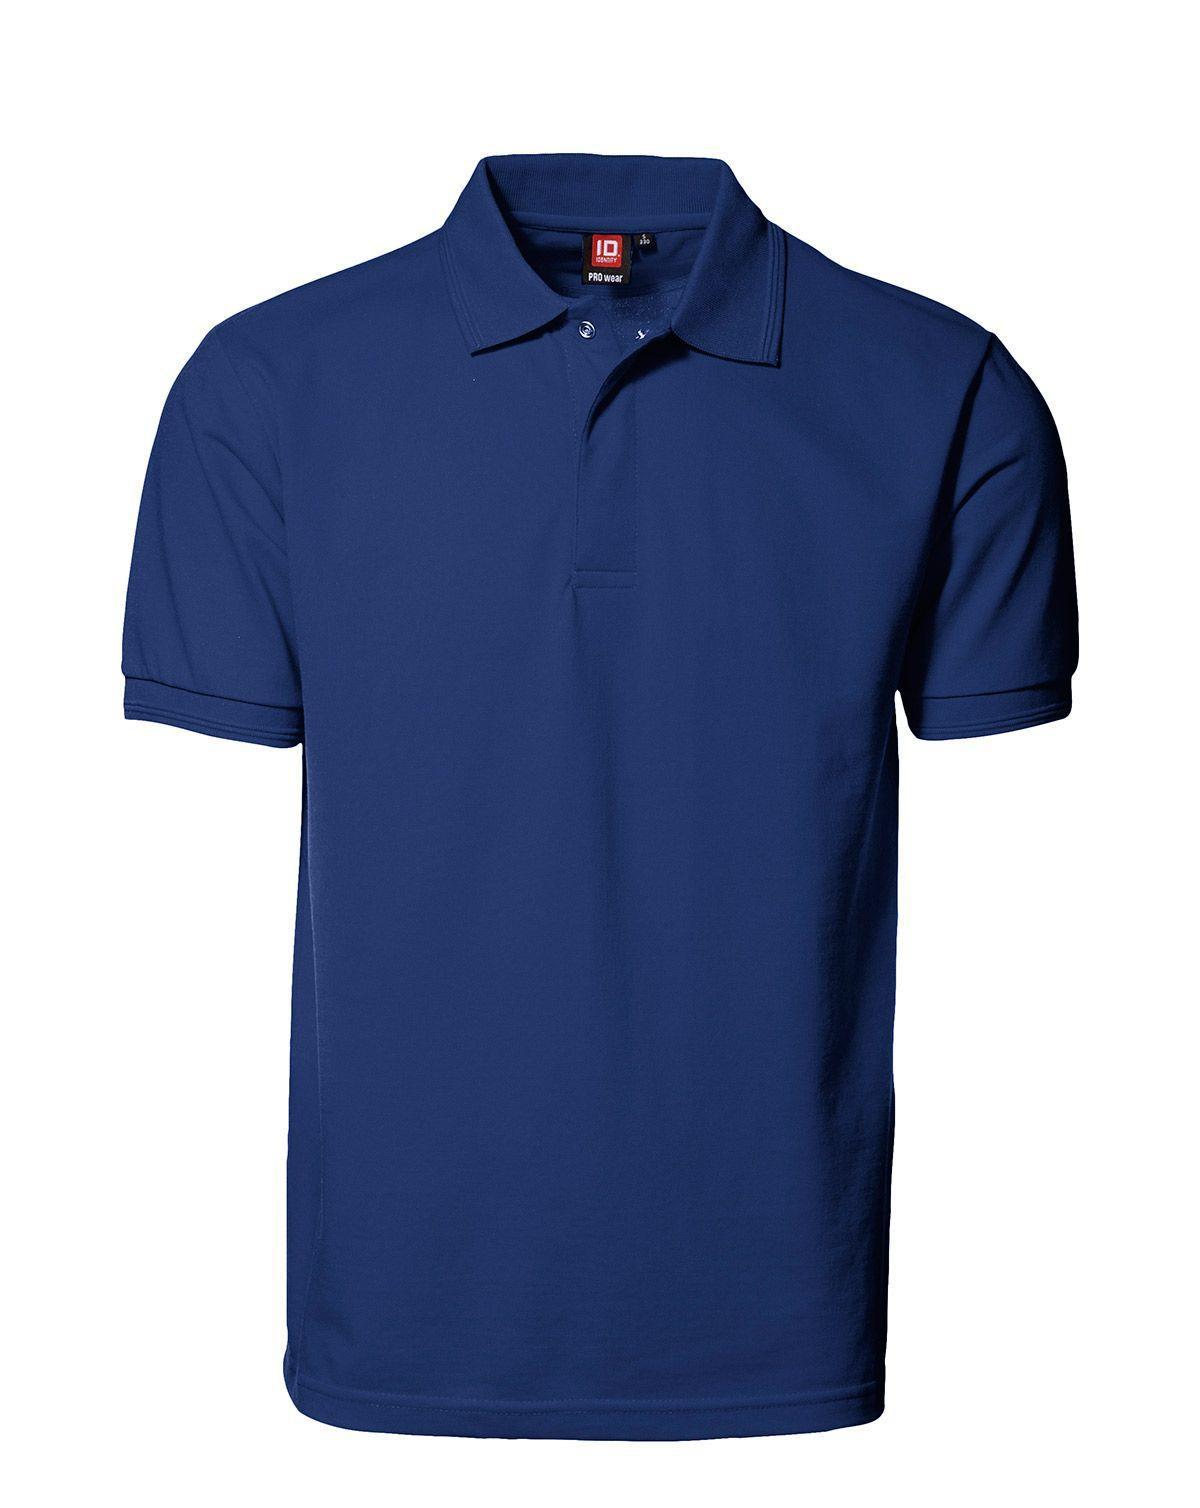 ID PRO Wear Poloshirt m. Tryckknapp (Kungsblå, XS)